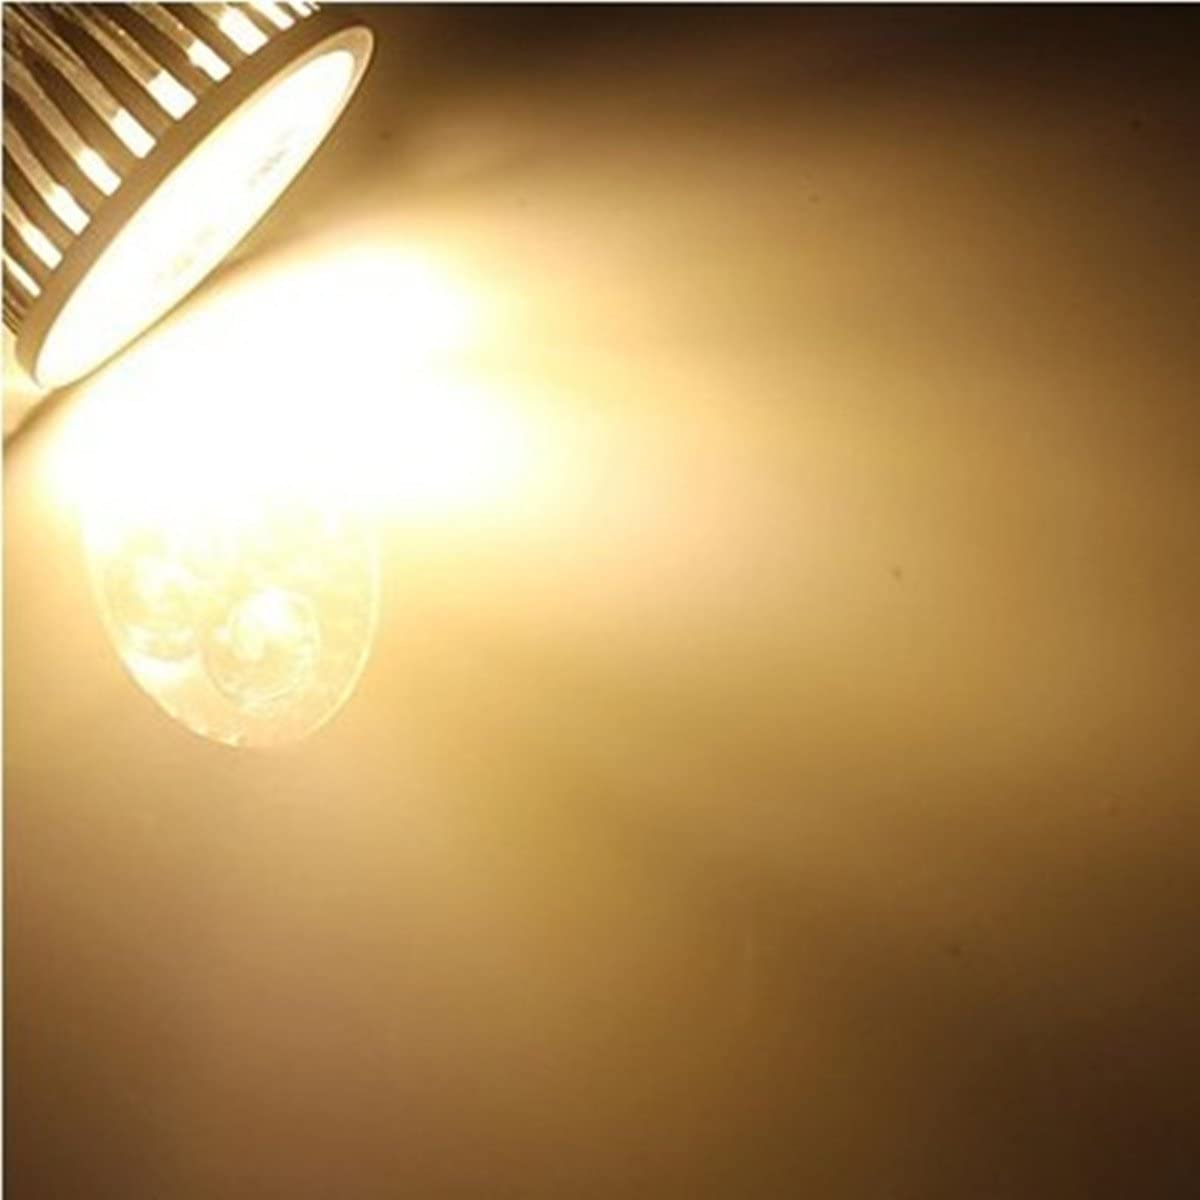 blanc chaud Pixnor YouOKLight 95-265V 5W GU10 500LM 3000 K lumi/ère LED projecteur Spot lampe